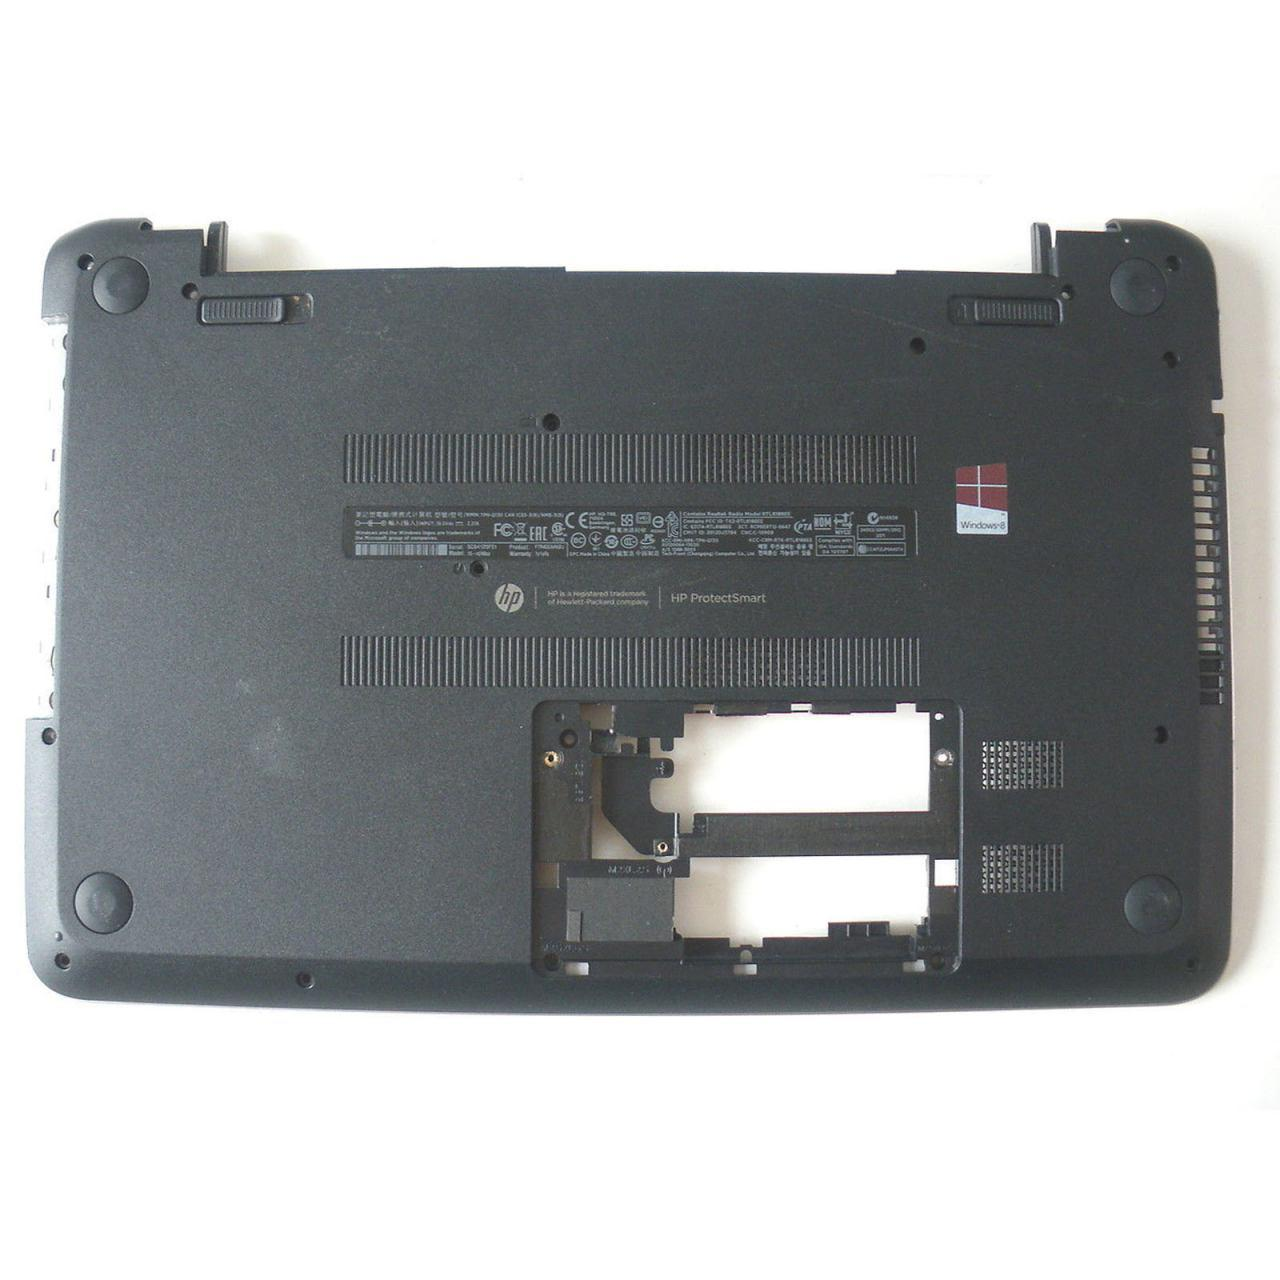 Carcasa inferioara (bottom case) laptop HP Pavilion 15n001sq  15N  zyu3iu86tp003